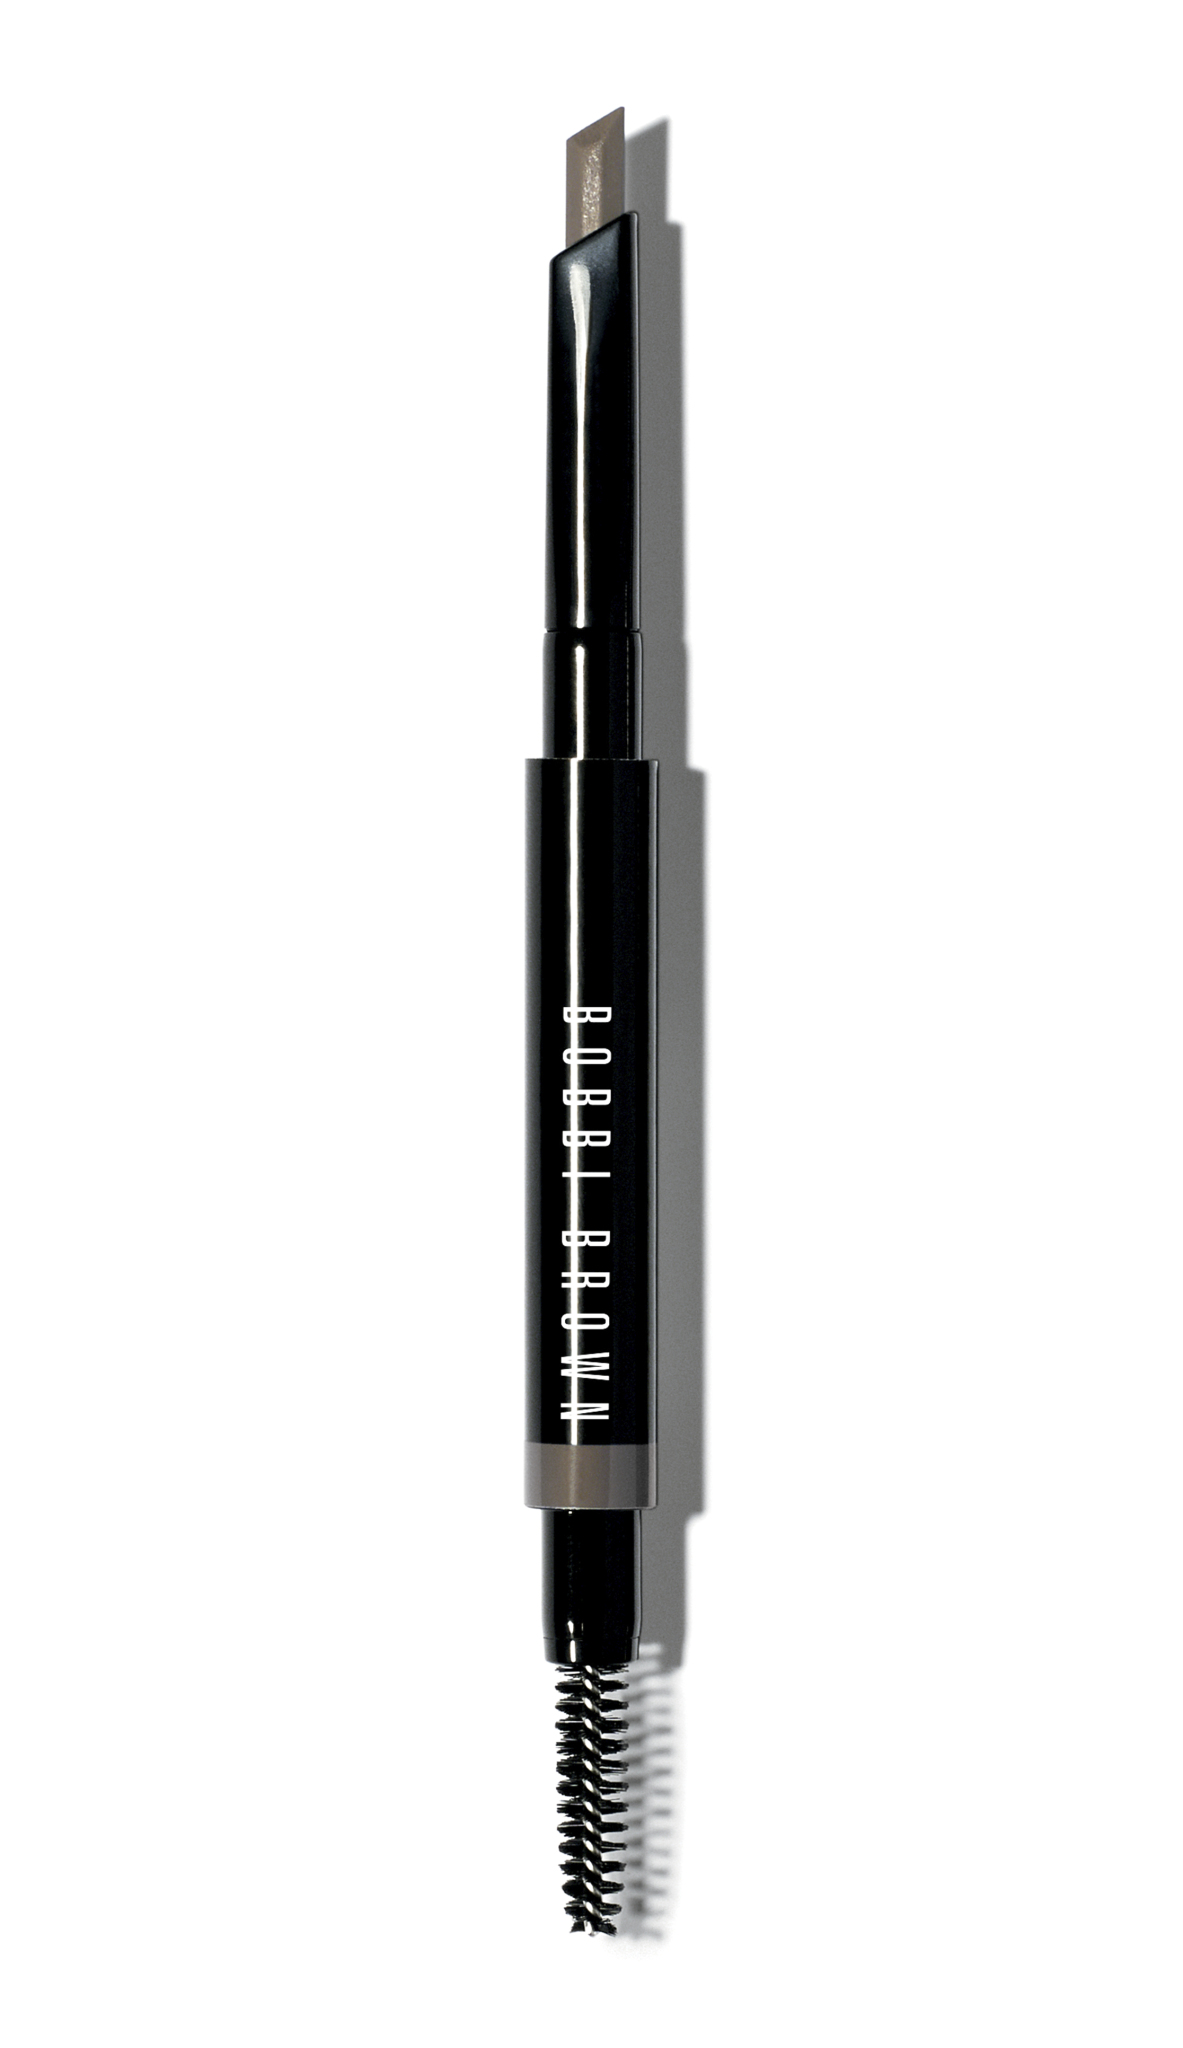 Bobbi Brown Perfectly Defined Longwear Brow Pencil, mahogany